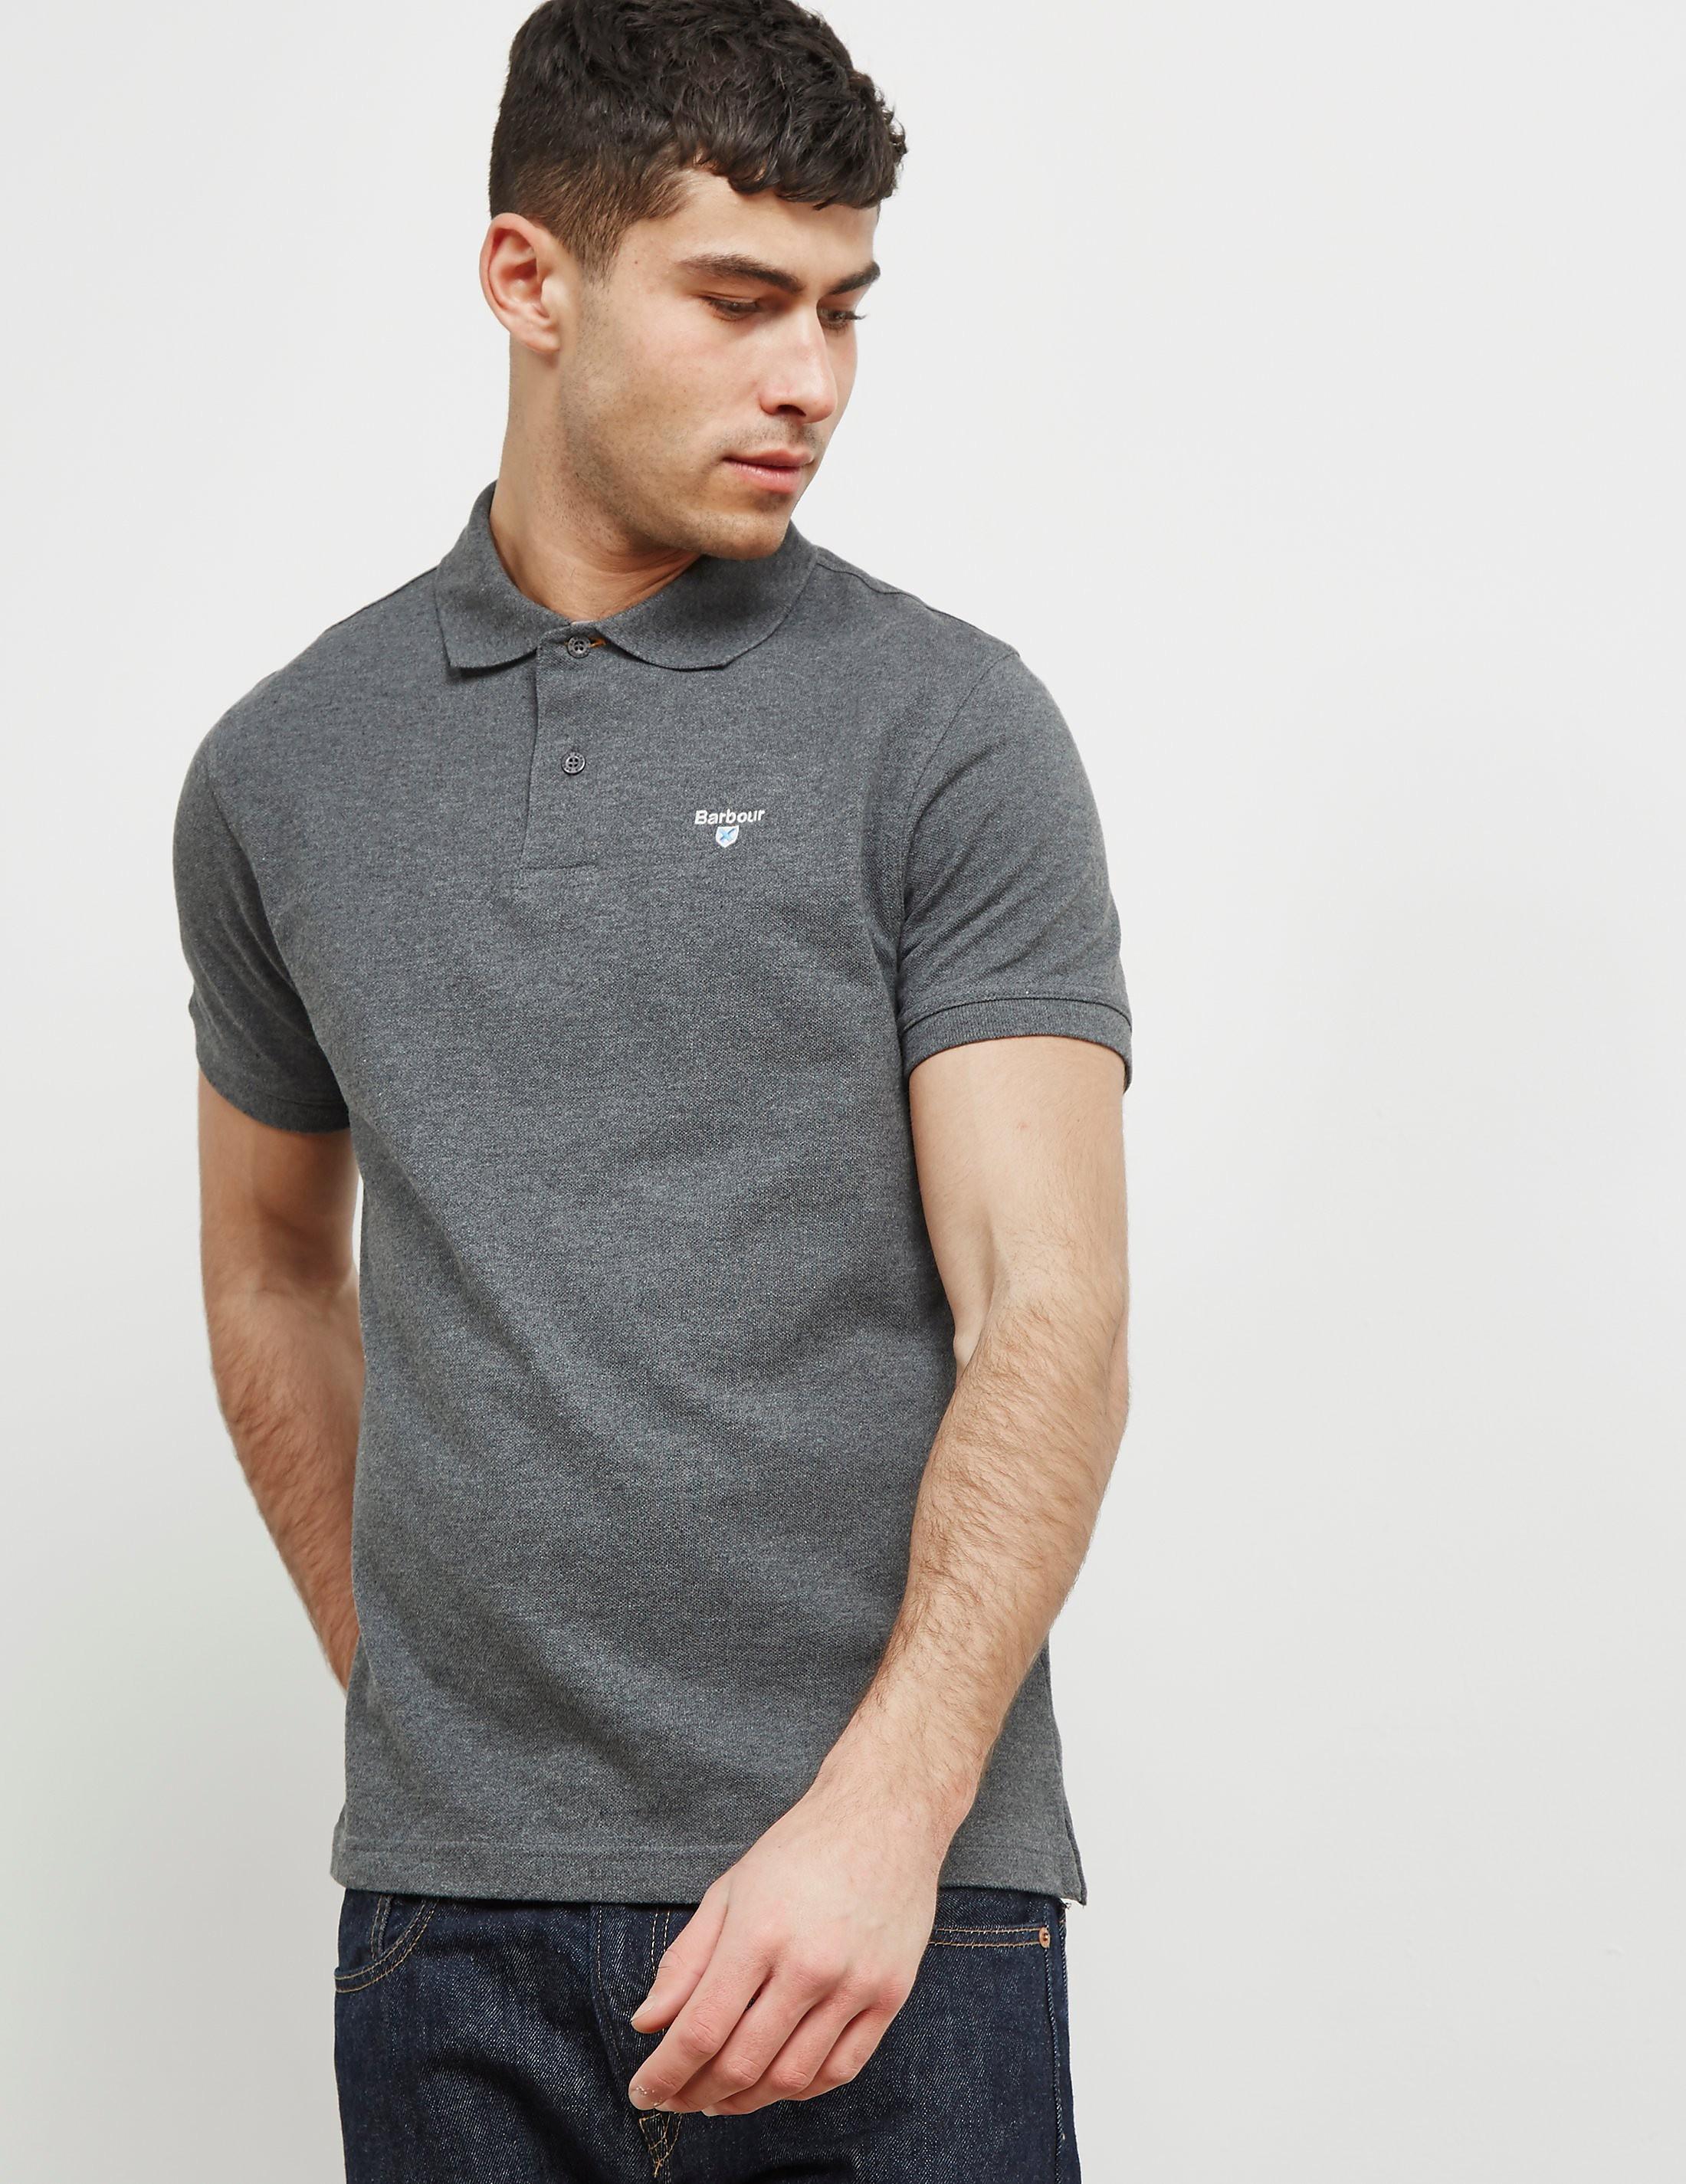 Barbour Pique Short Sleeve Polo Shirt